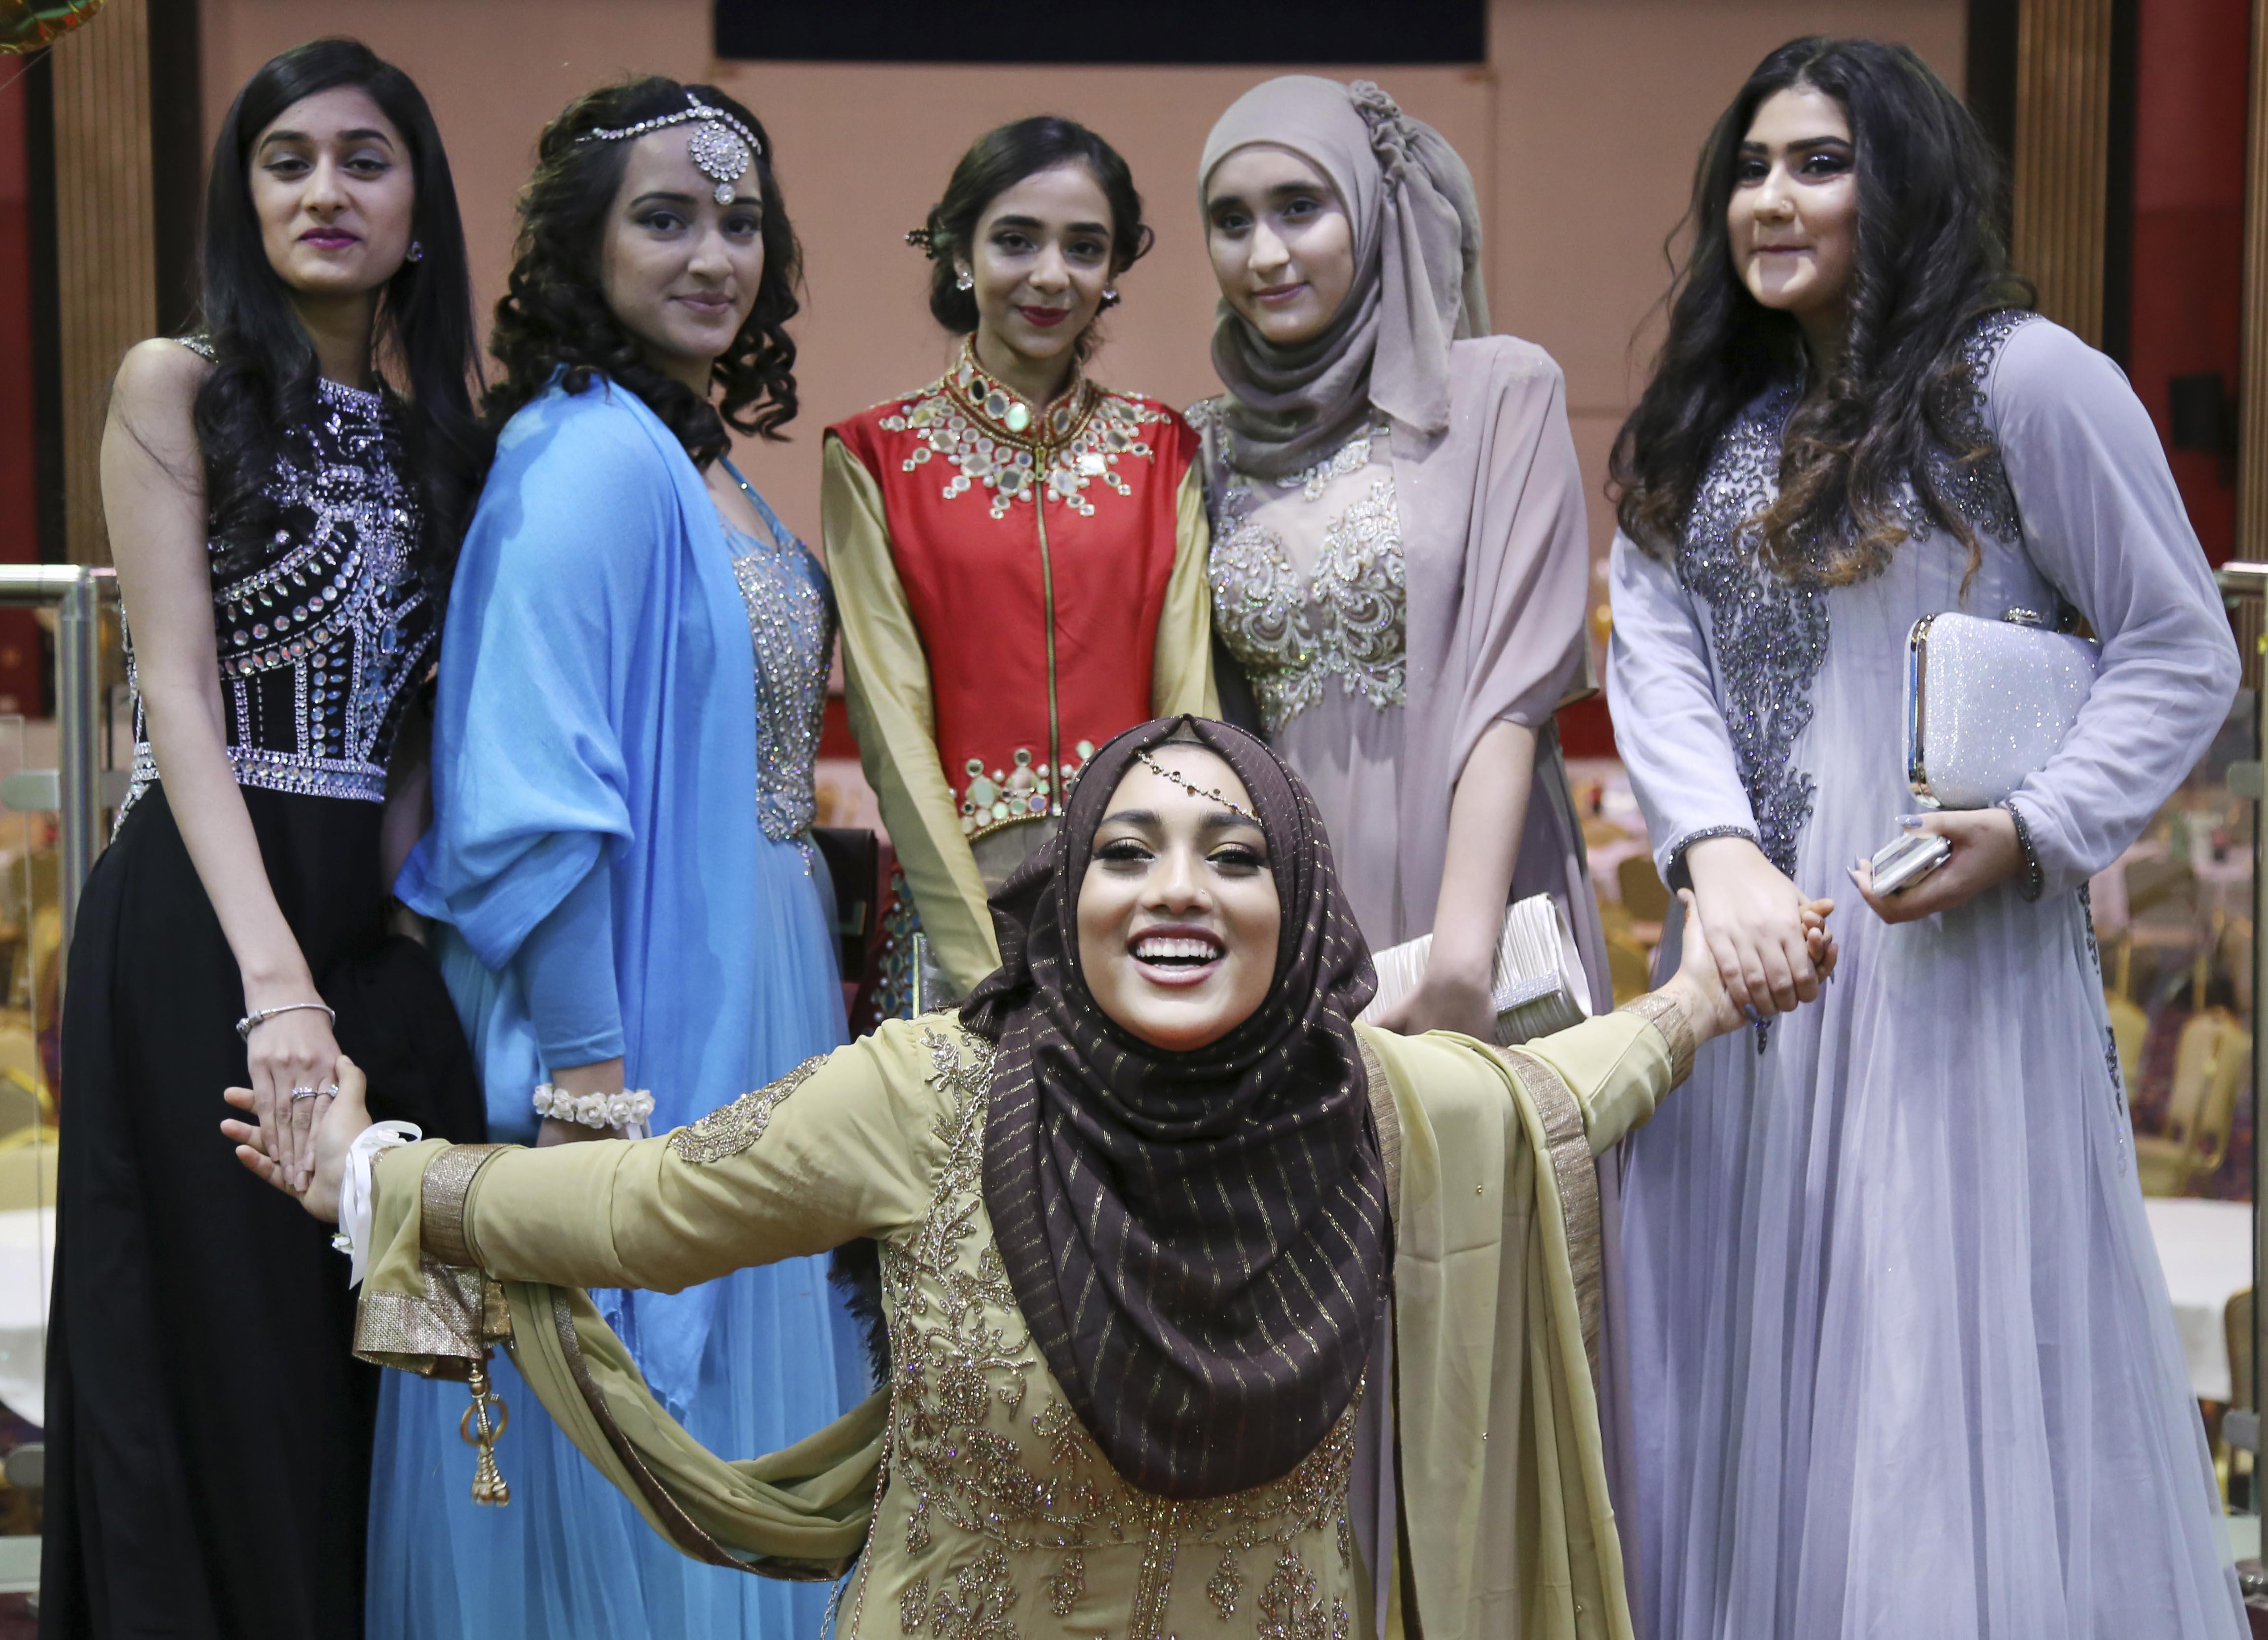 Iqra Ahmed 11H, Maryam Ali 11N, Sahar Asif 11N, Faizah Nawaz 11H, Ammaarah Saghir 11N, Maharun Uddin 11H 2-edit